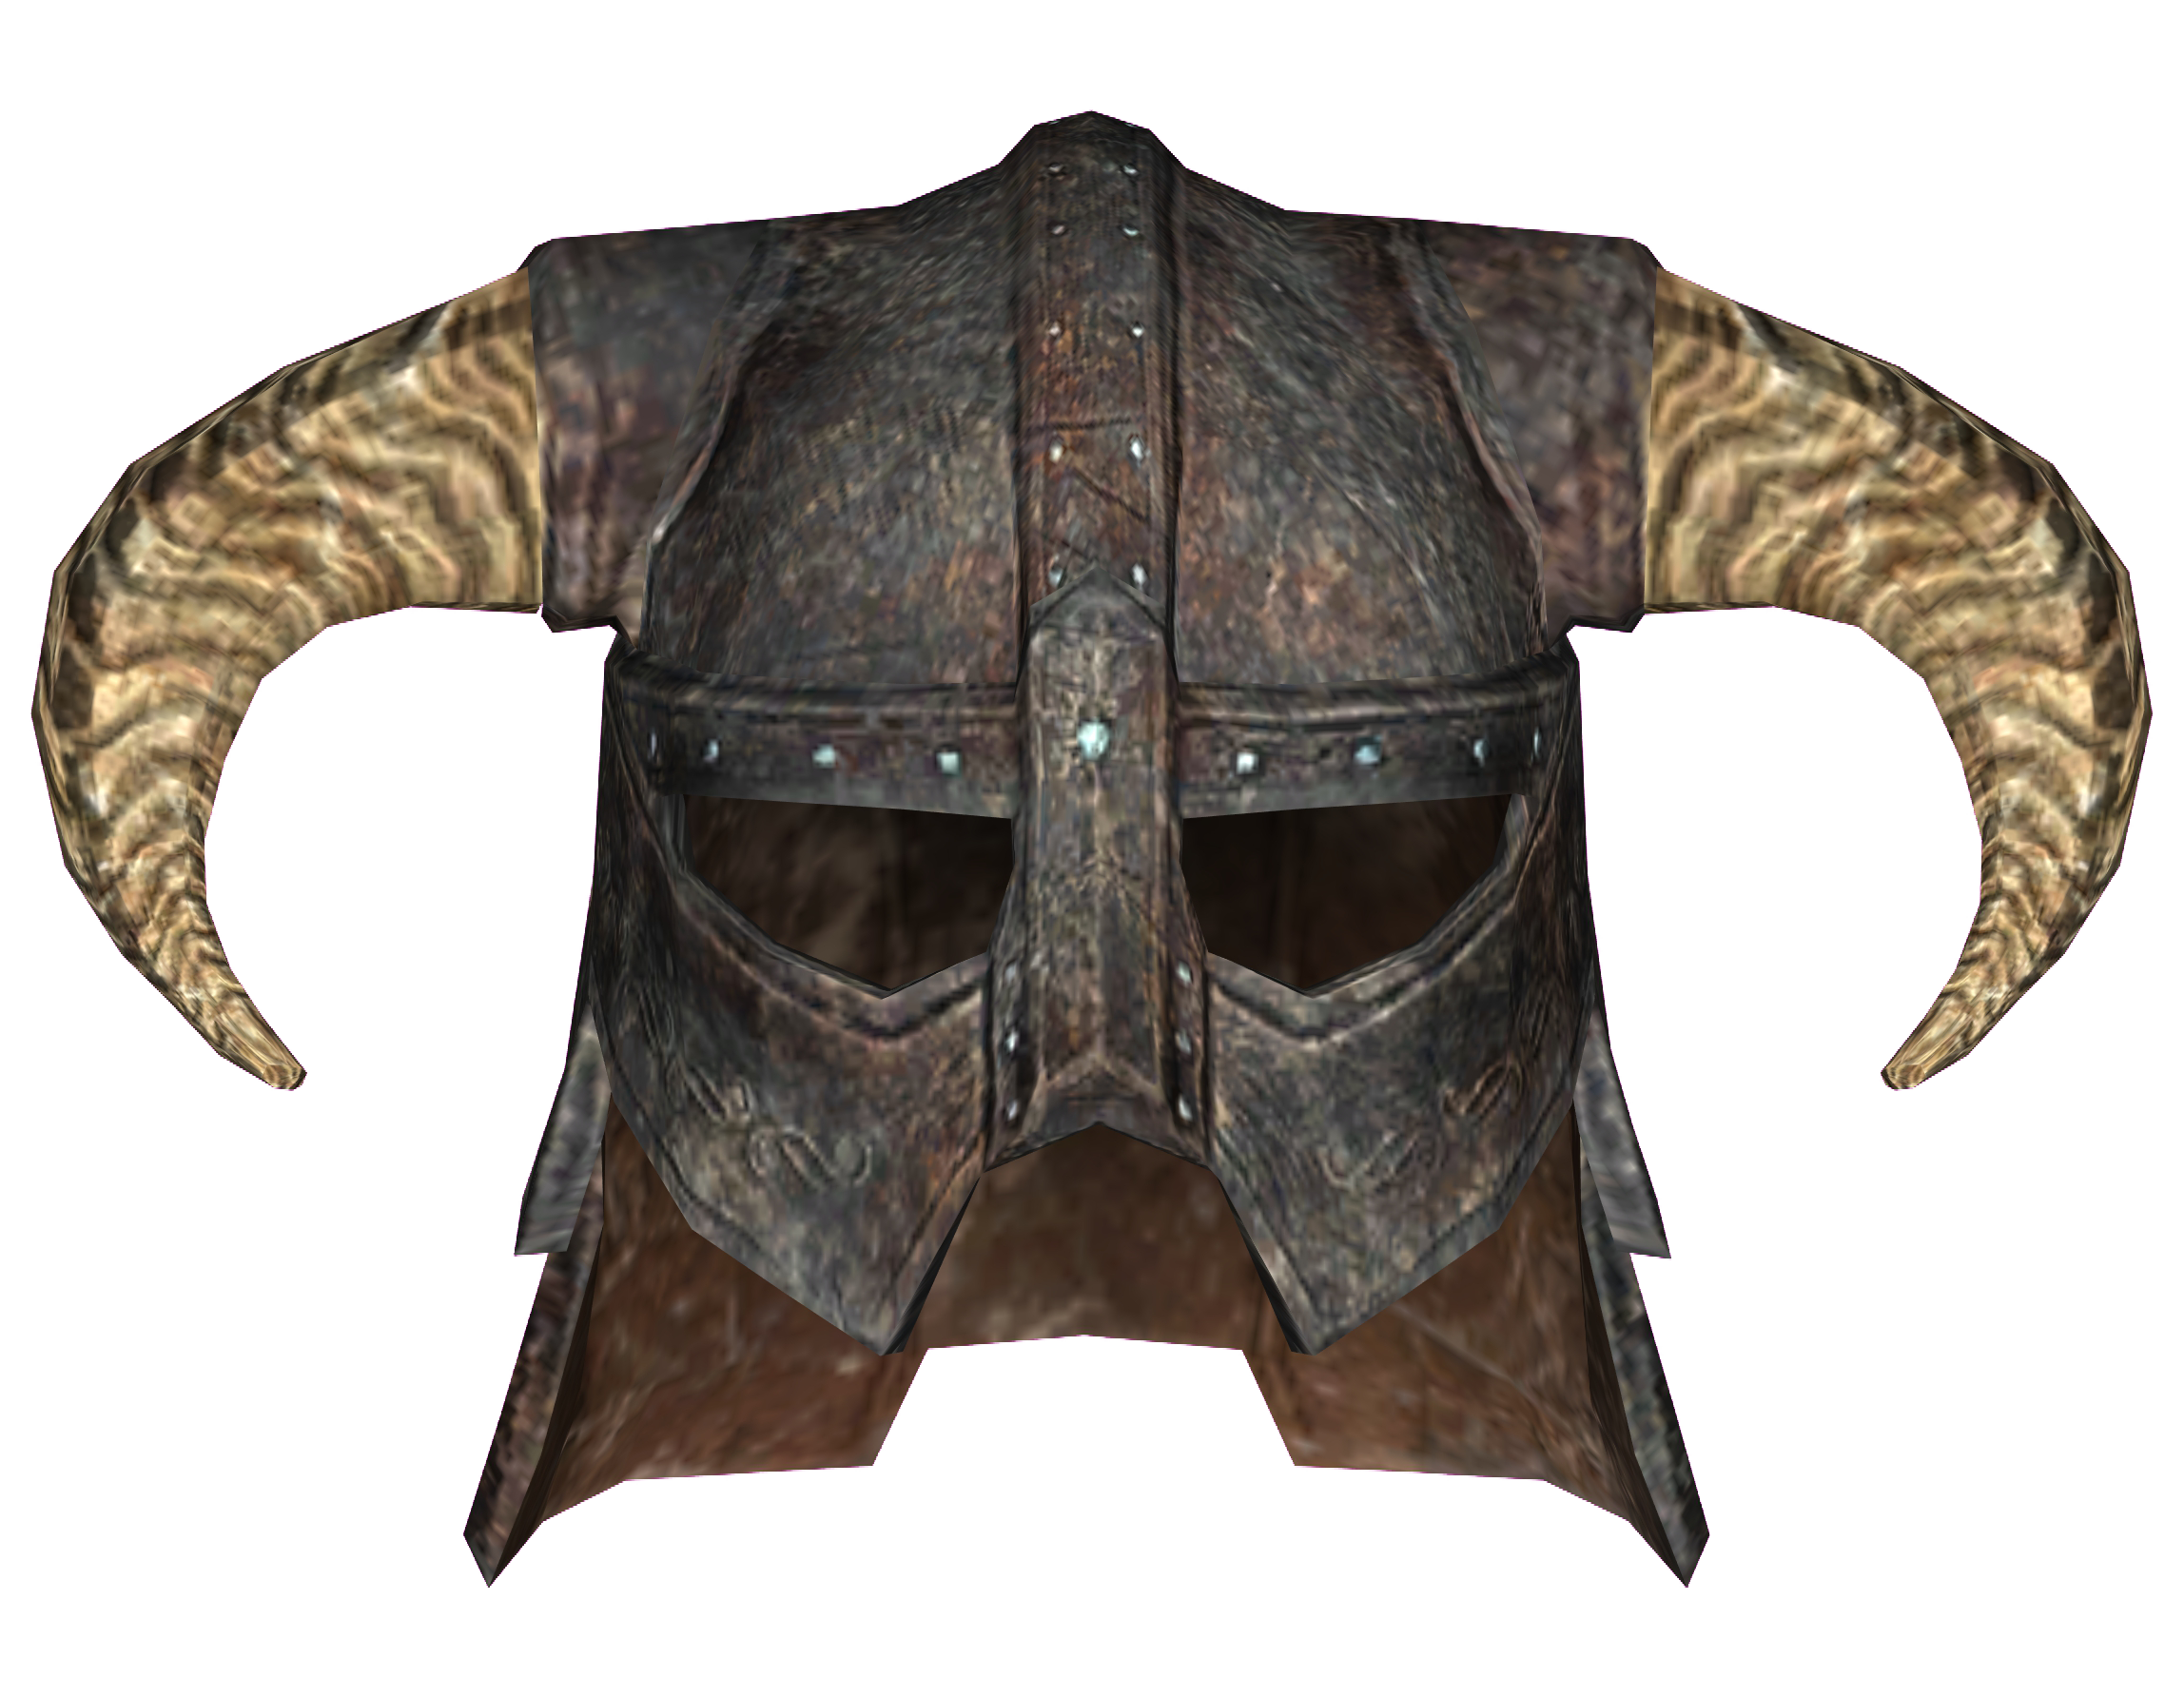 Skyrim helmet png. Image iron elder scrolls